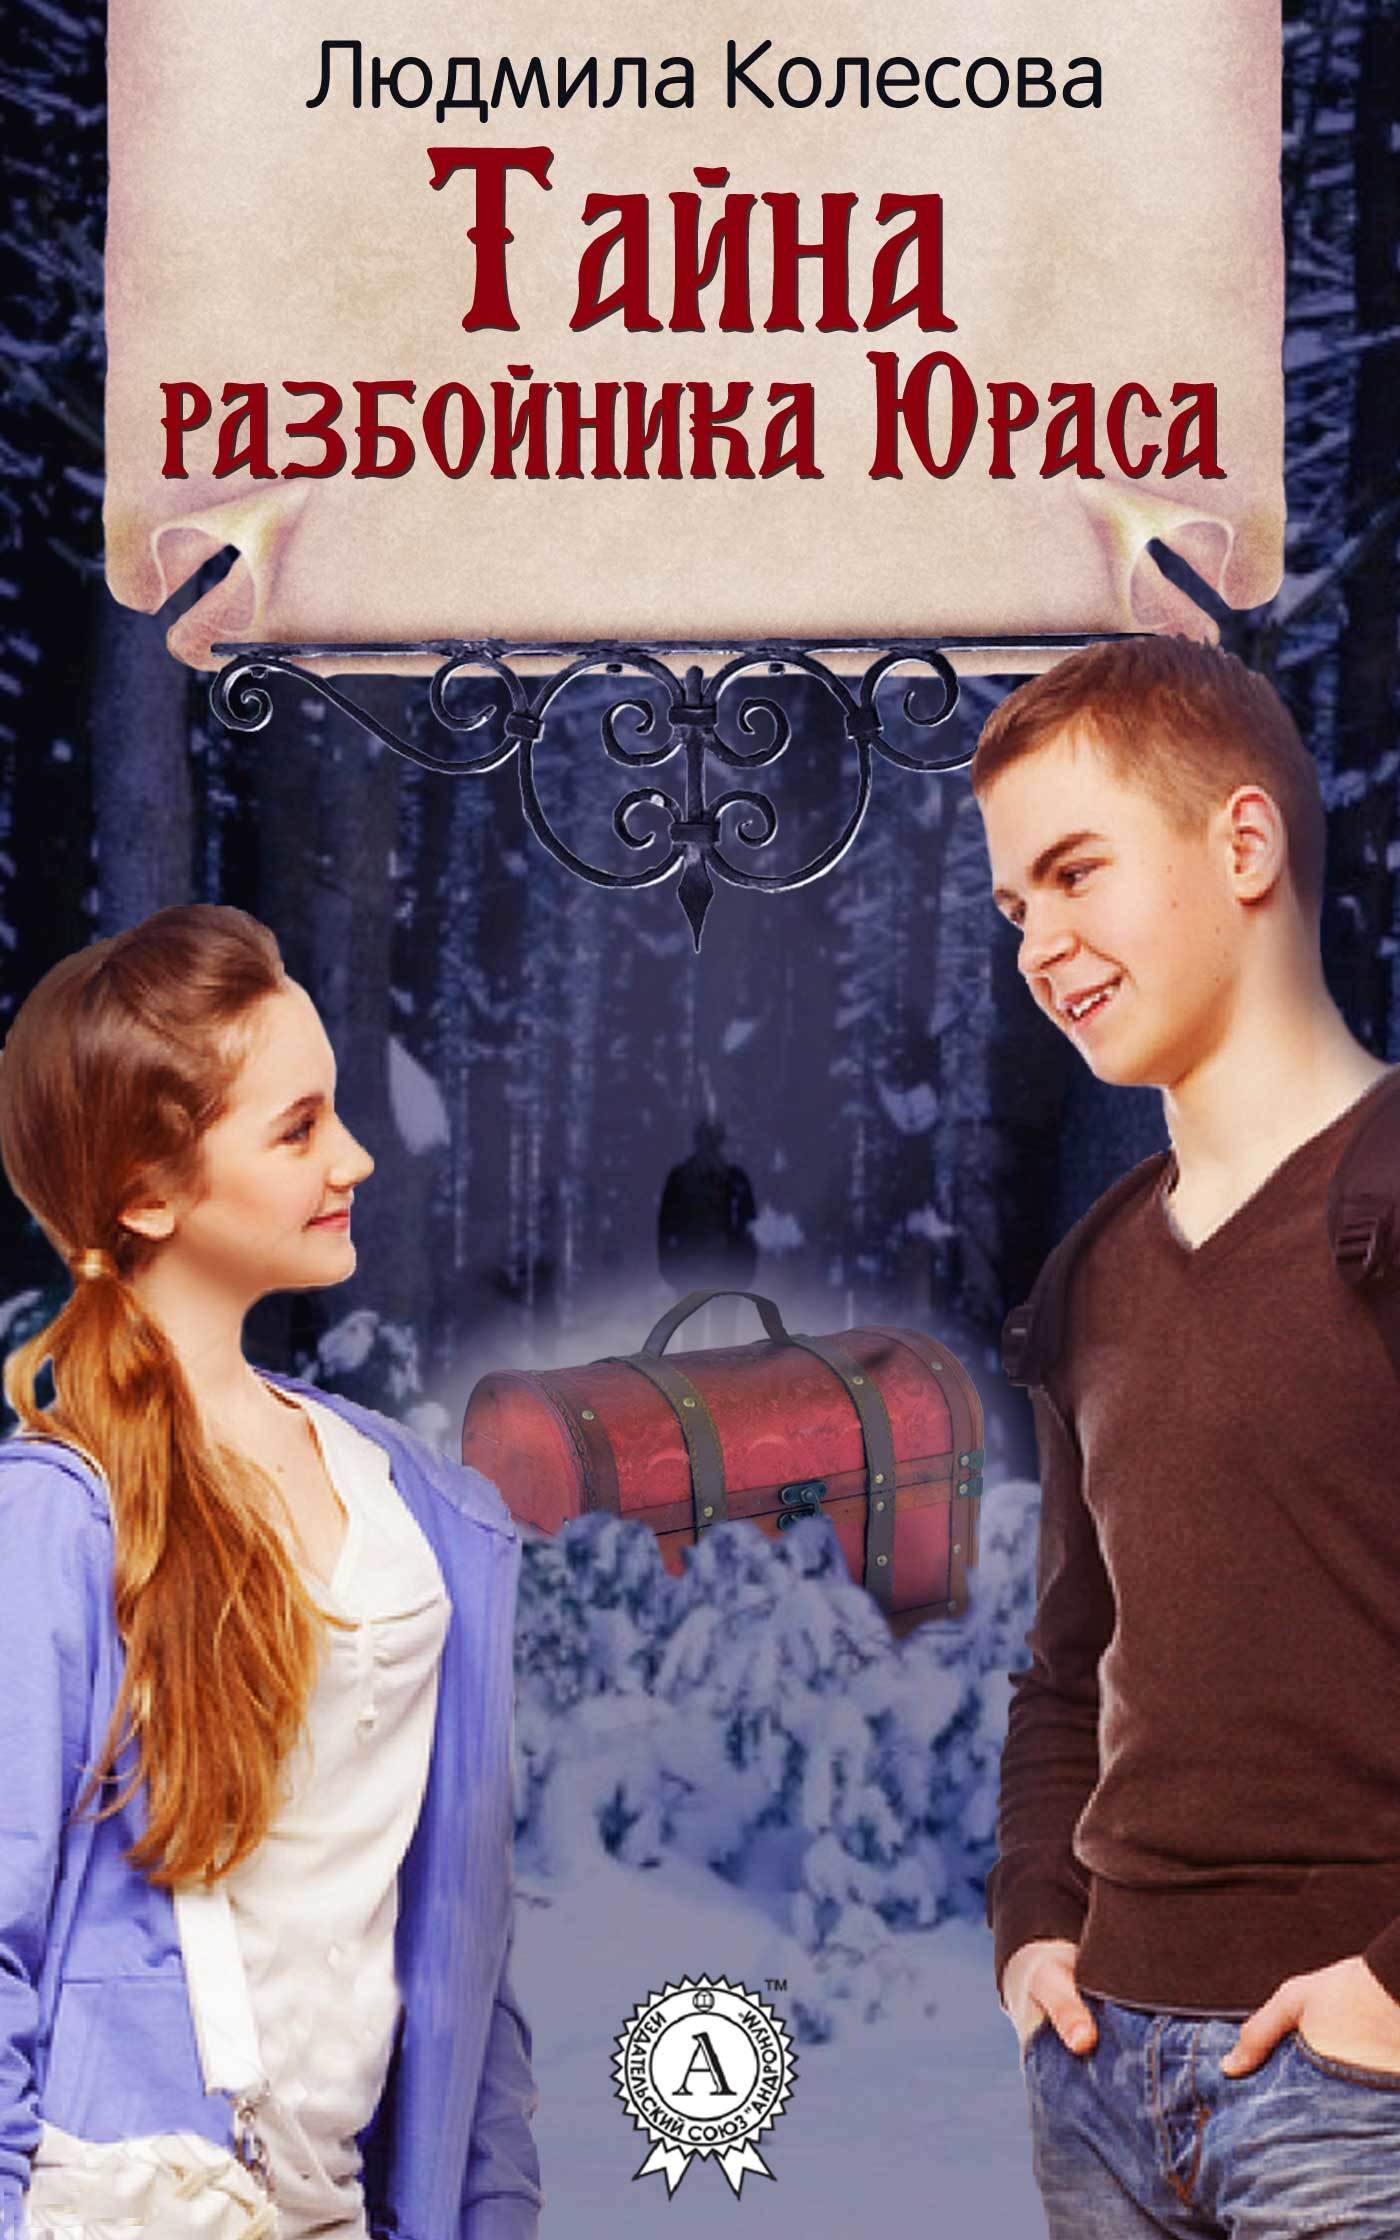 Людмила Колесова - Тайна разбойника Юраса